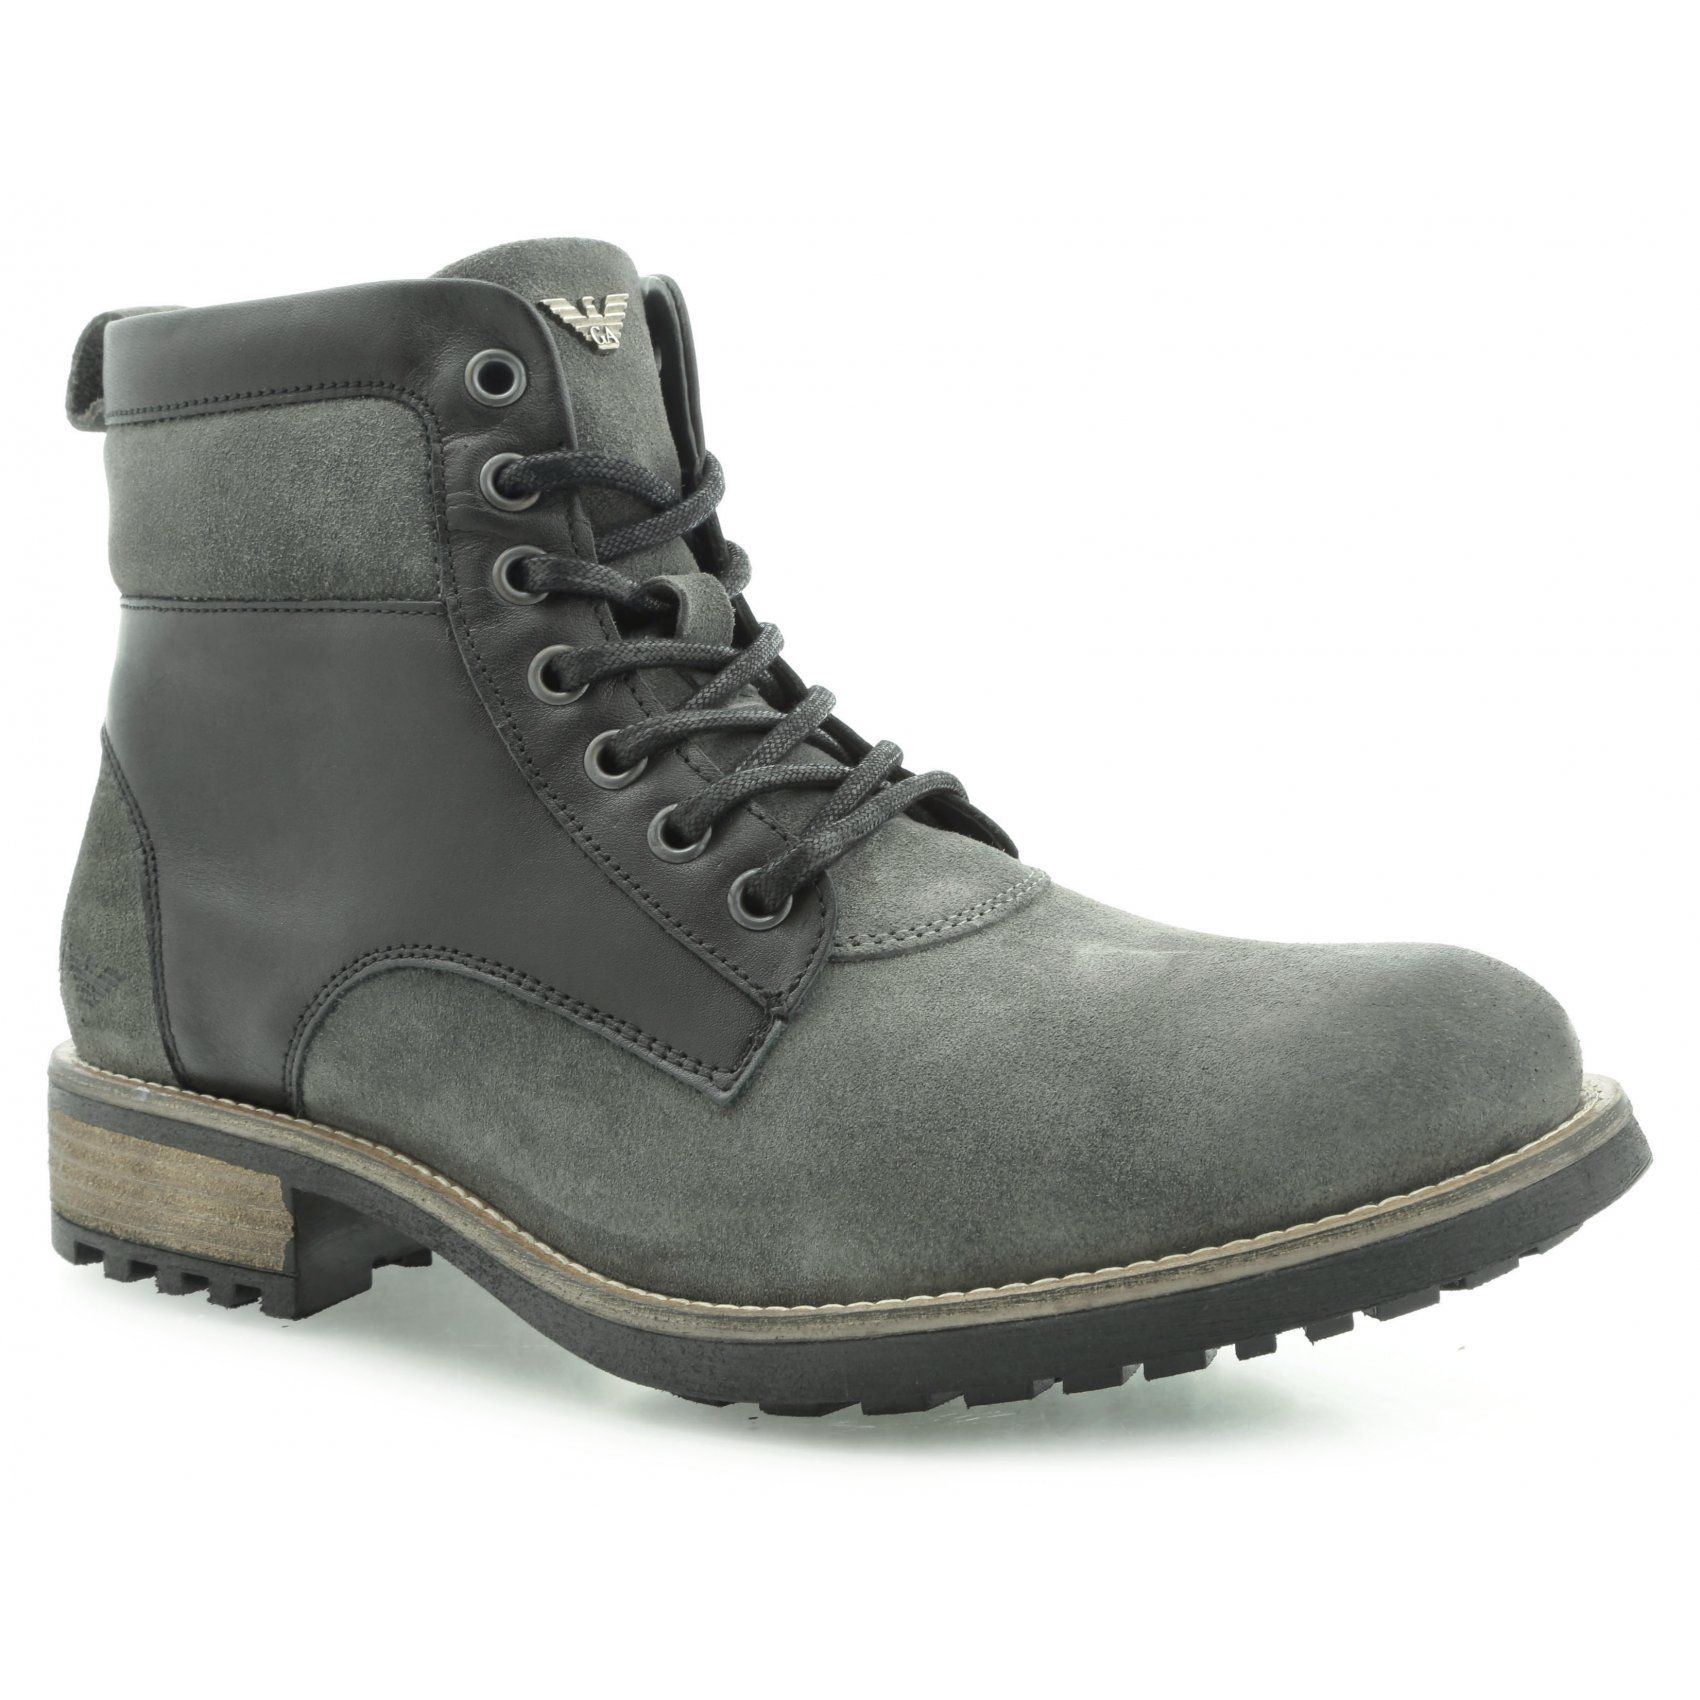 Armani Jeans Z6585 78 Desert Boots 12 Black Z6585 78 12 Buty Meskie Trapery W Riccardo Pl Boots Desert Boots Hiking Boots